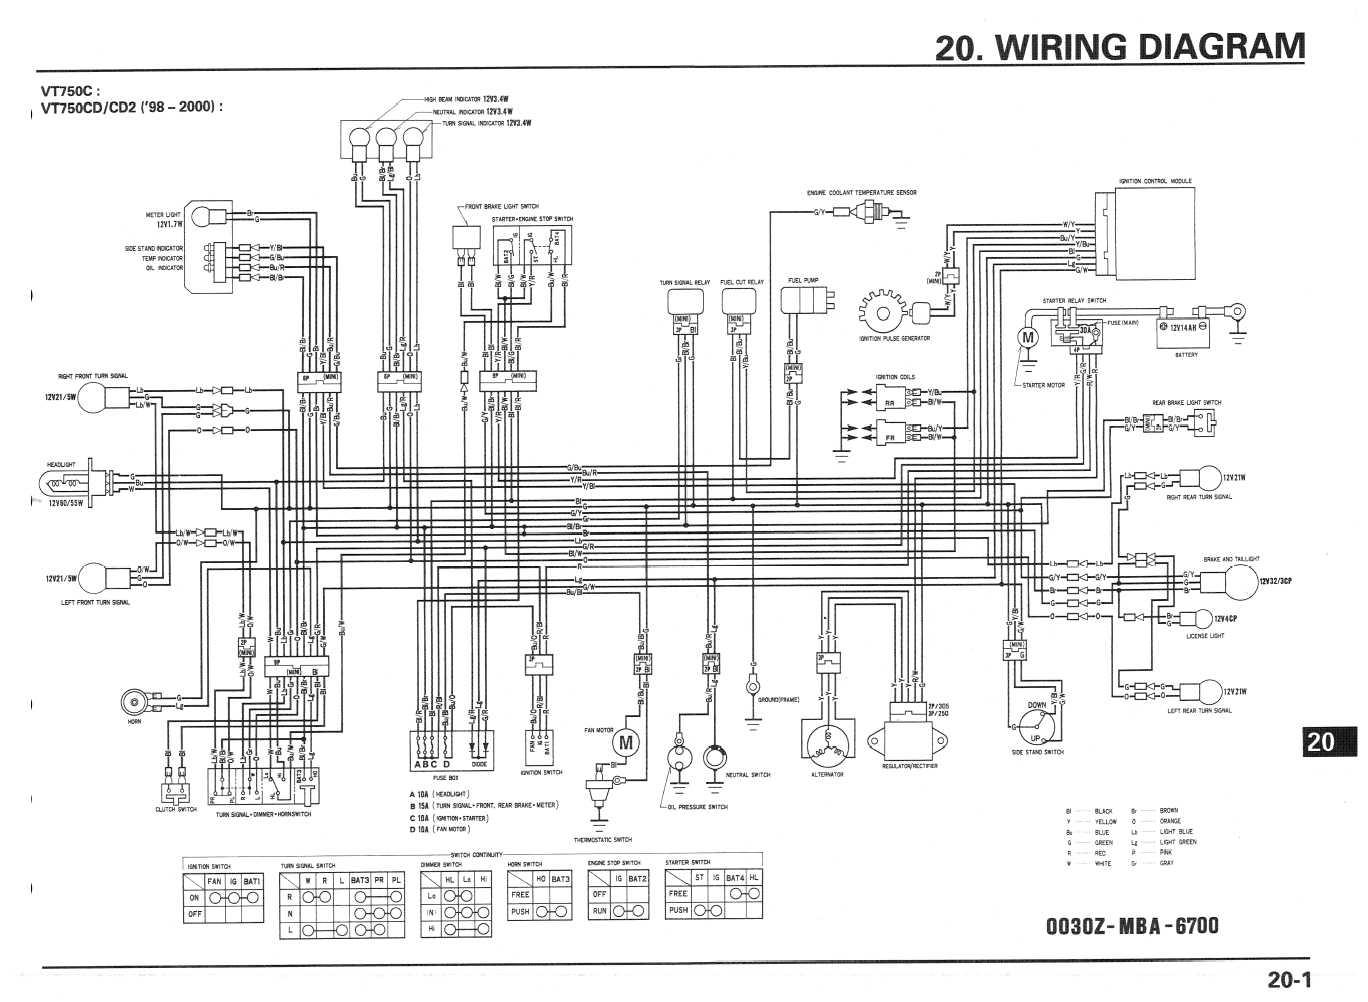 Wiring Diagram For Honda Shadow